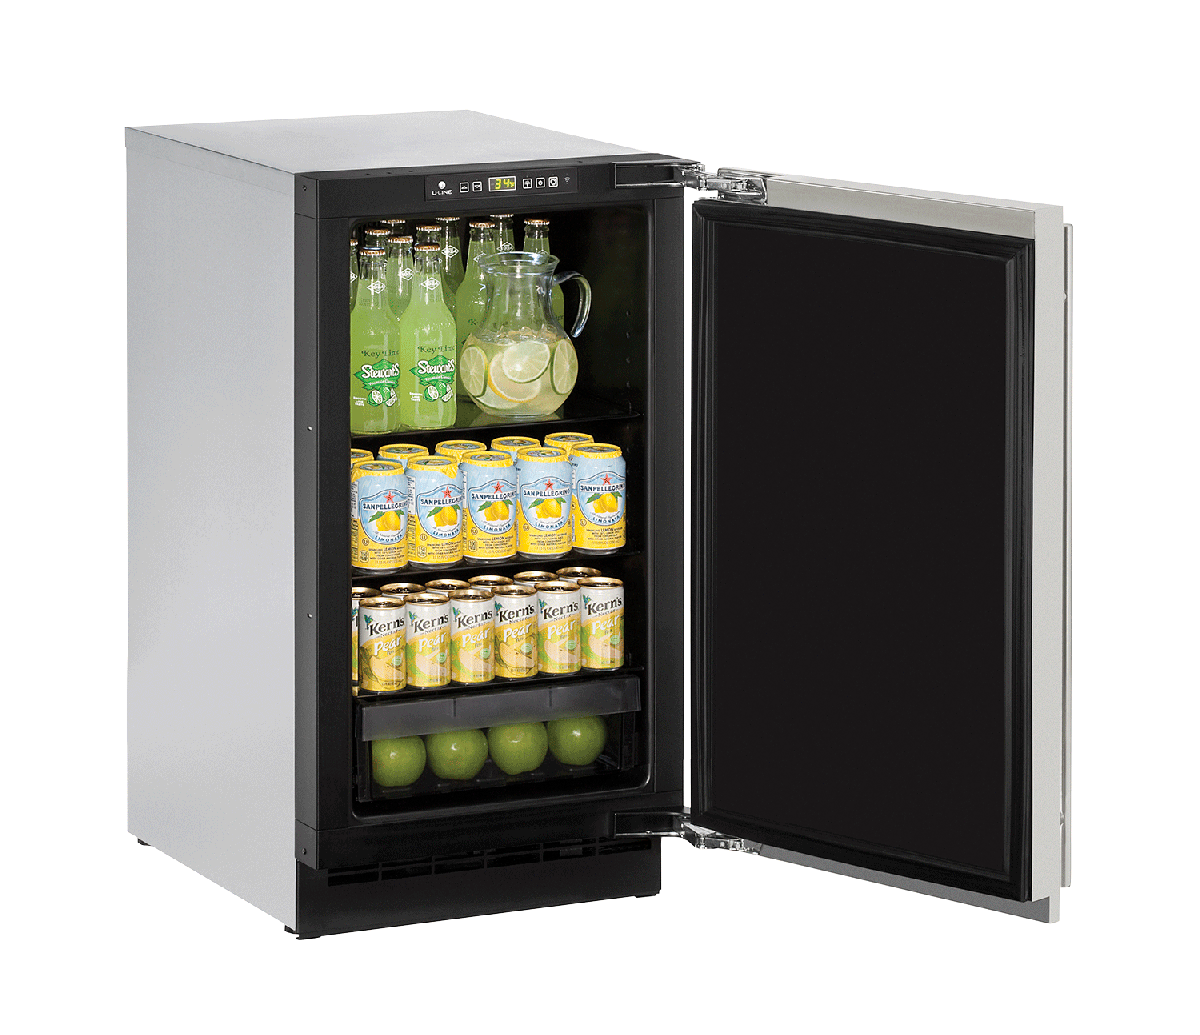 "Solid Refrigerator 18"" Reversible Hinge Stainless 115v"